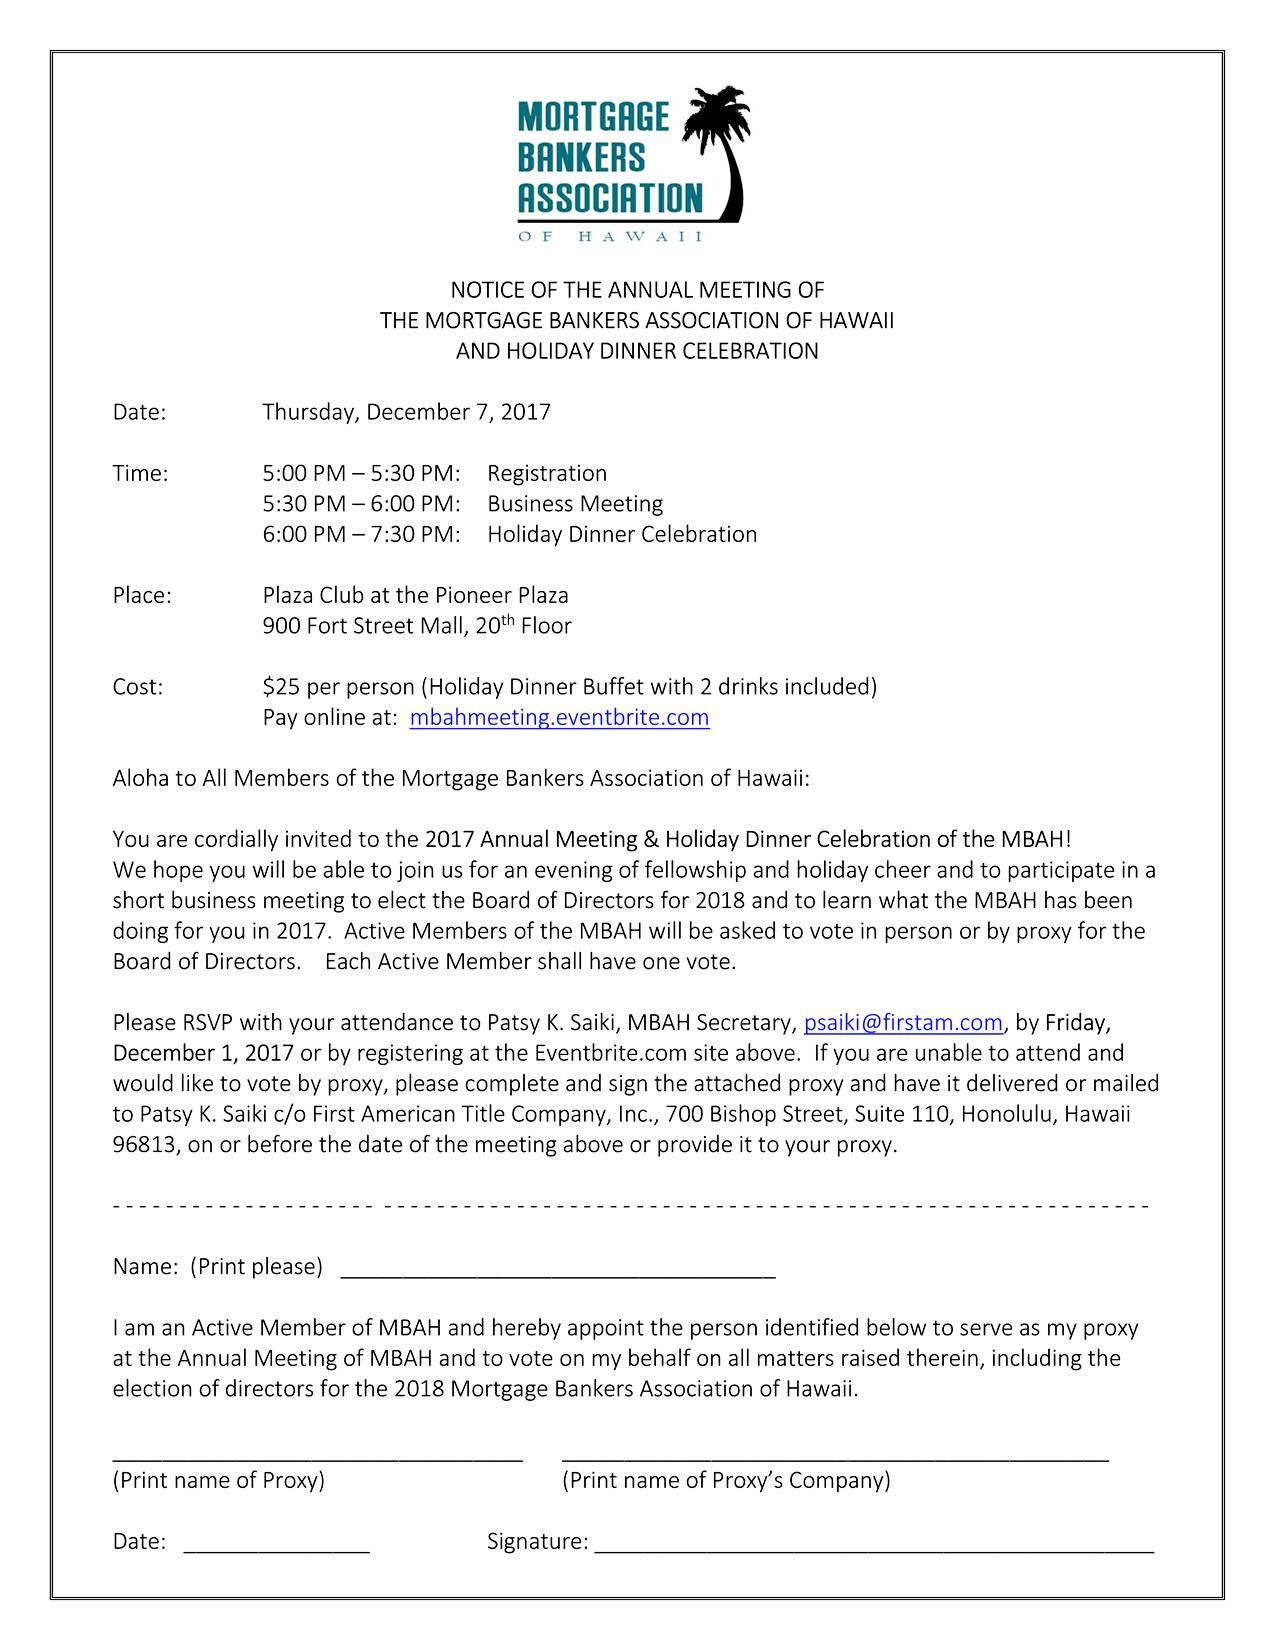 2017 Annual Membership Meeting Notice